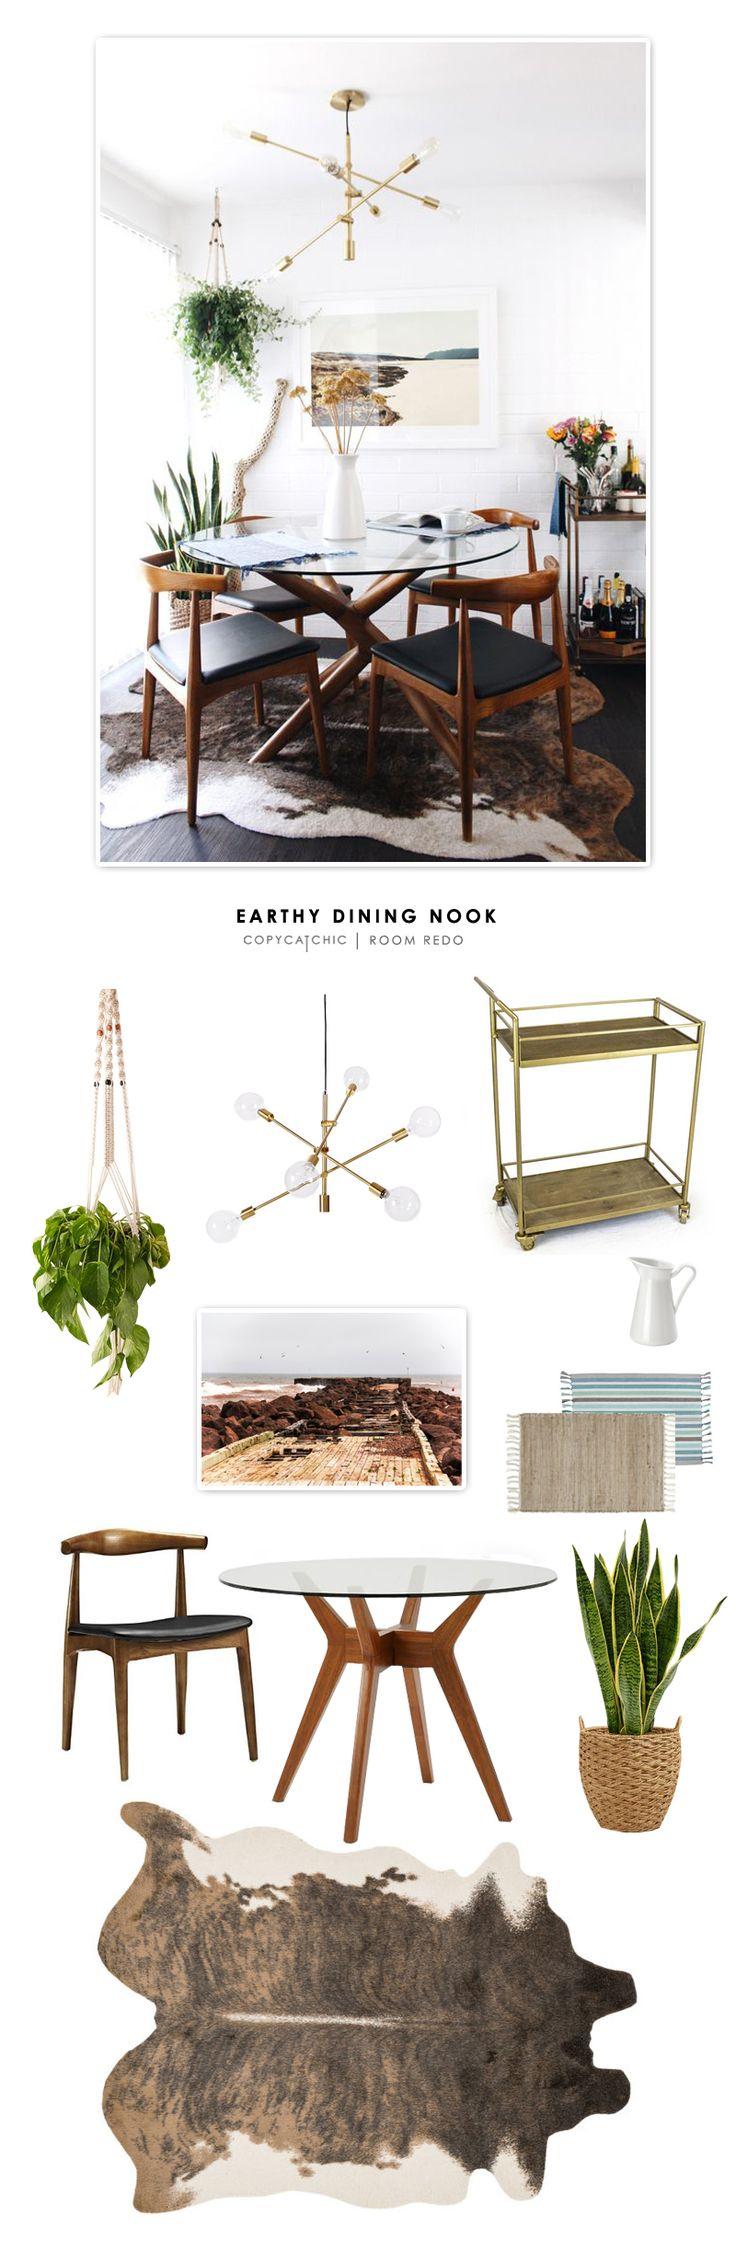 Copy Cat Chic Room Redo | Earthy Dining Nook